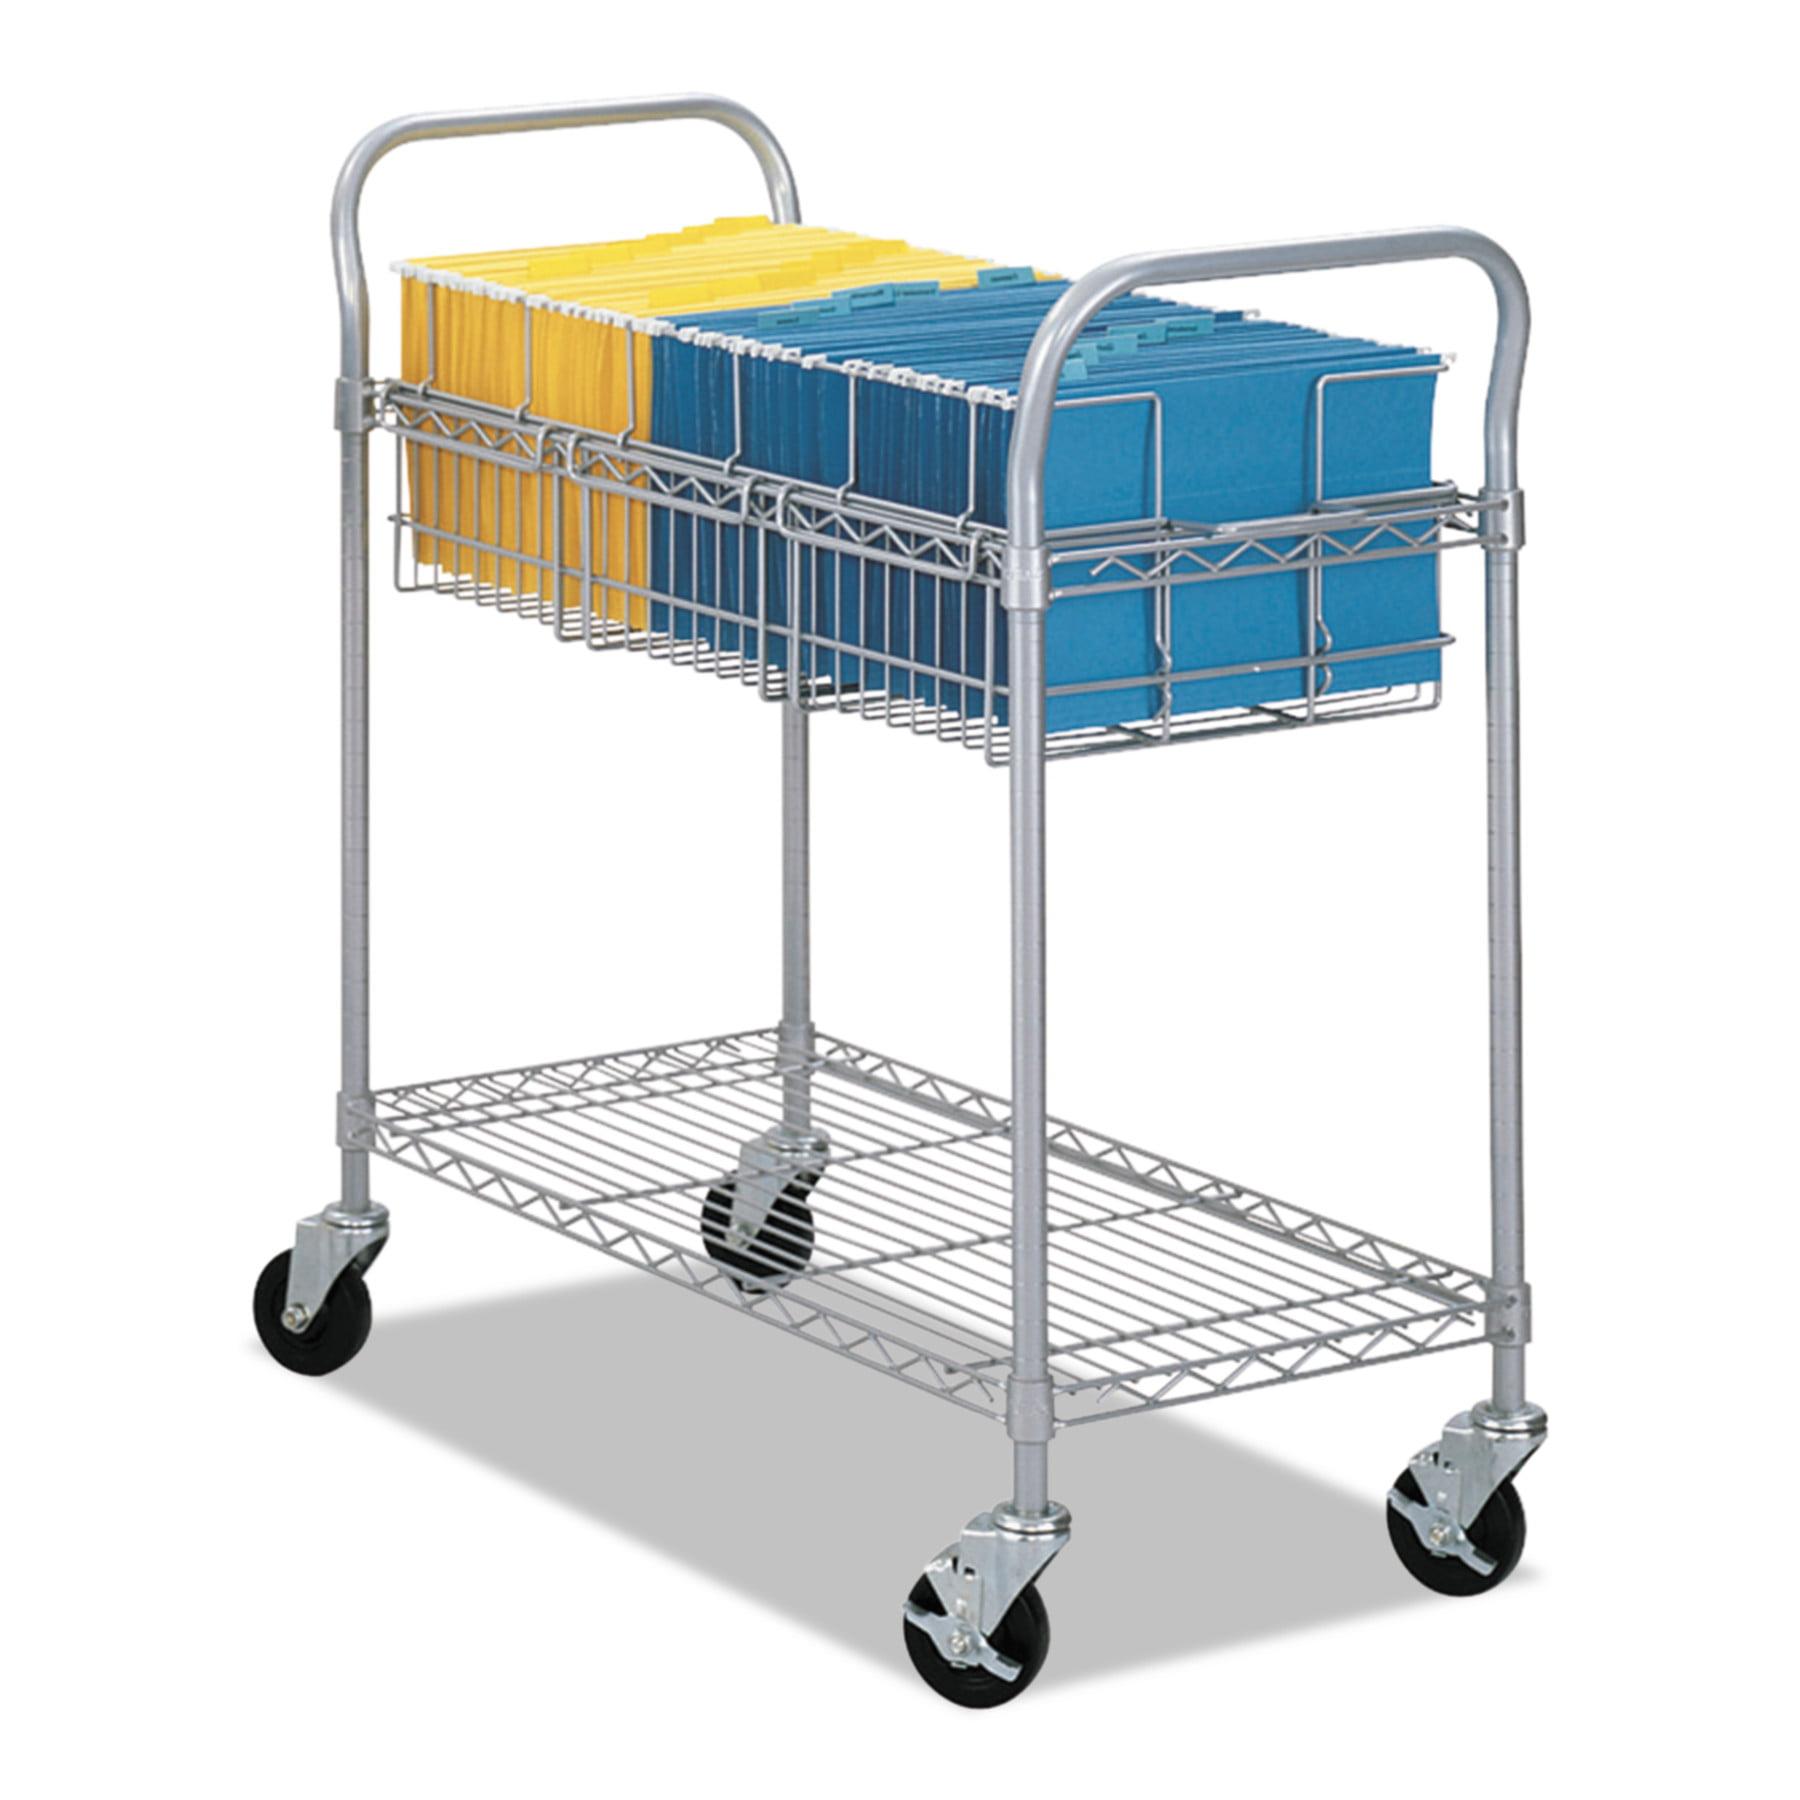 Safco Wire Mail Cart, 600-lb Cap, 18-3/4w x 39d x 38-1/2h, Metallic Gray -SAF5236GR